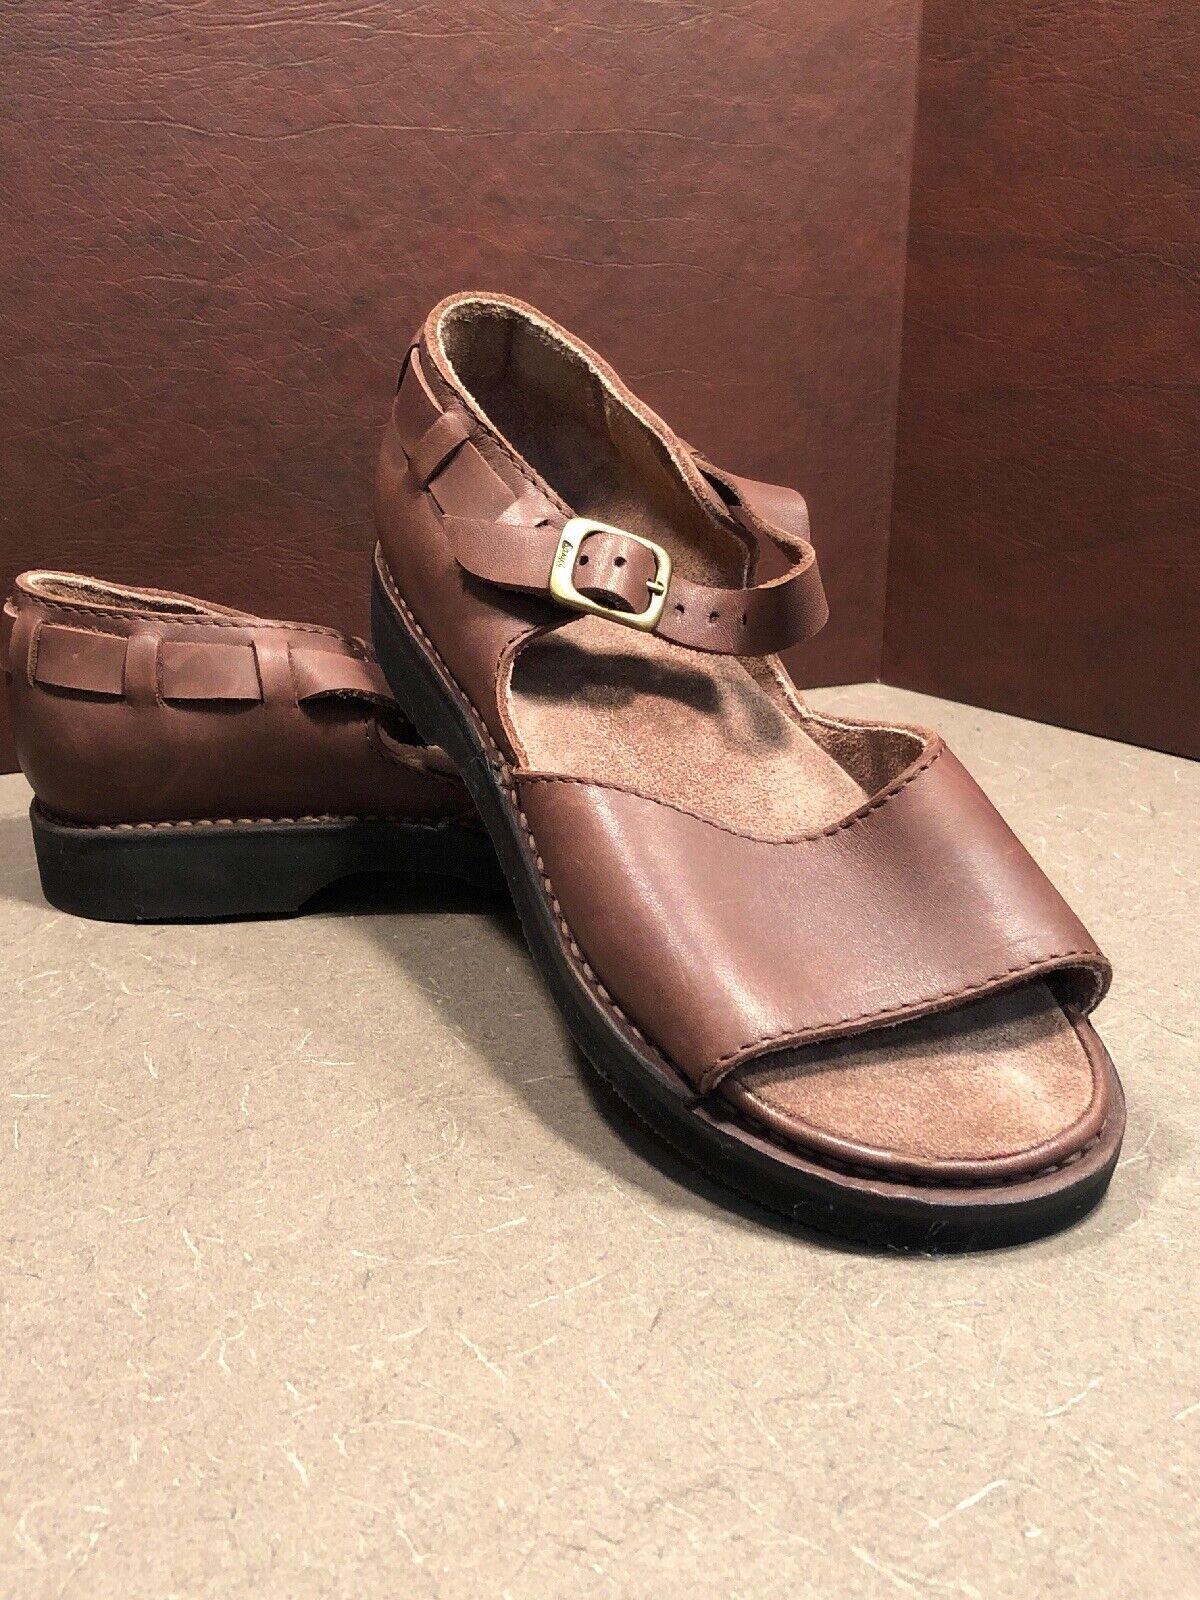 Basics shoe Company Handmade   Brown Leather Mary Janes Sandals 8.5 C